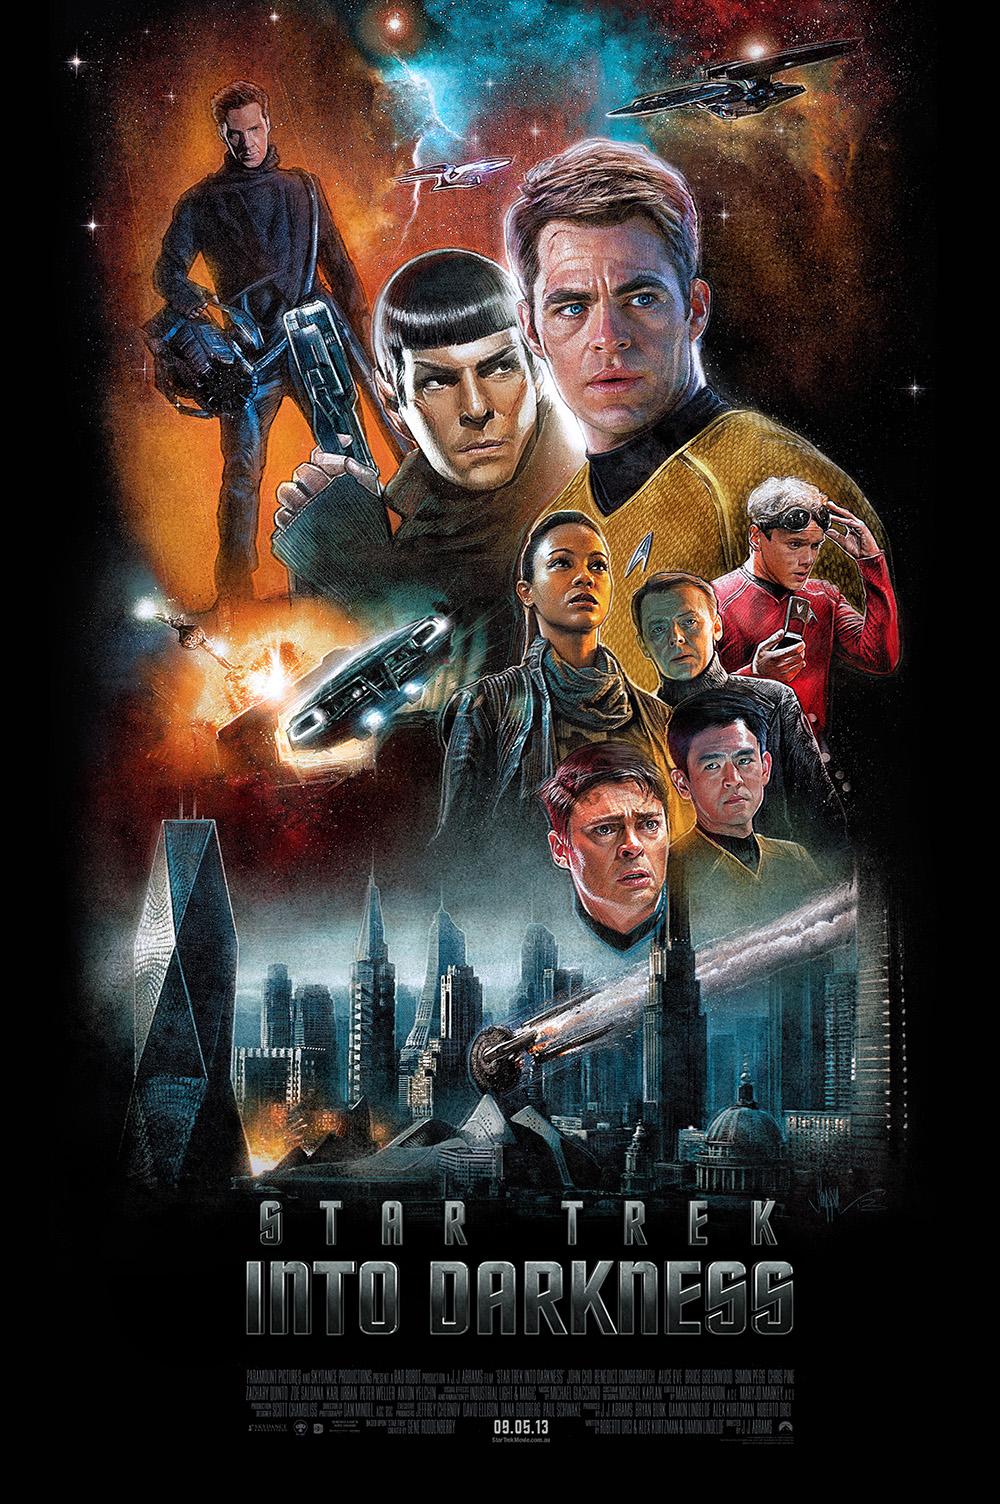 Star Trek: Into Darkness by Paul Shipper